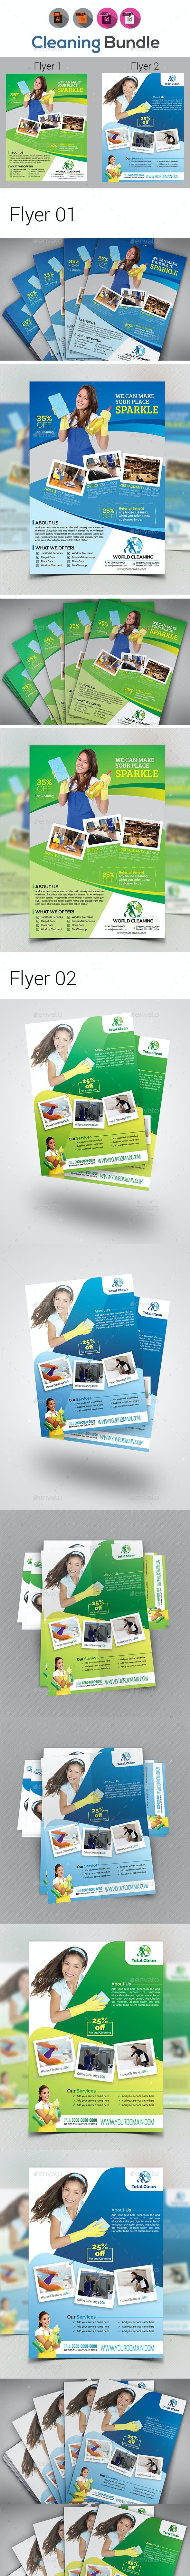 Cleaning Flyer Bundle V2 - Flyers Print Templates